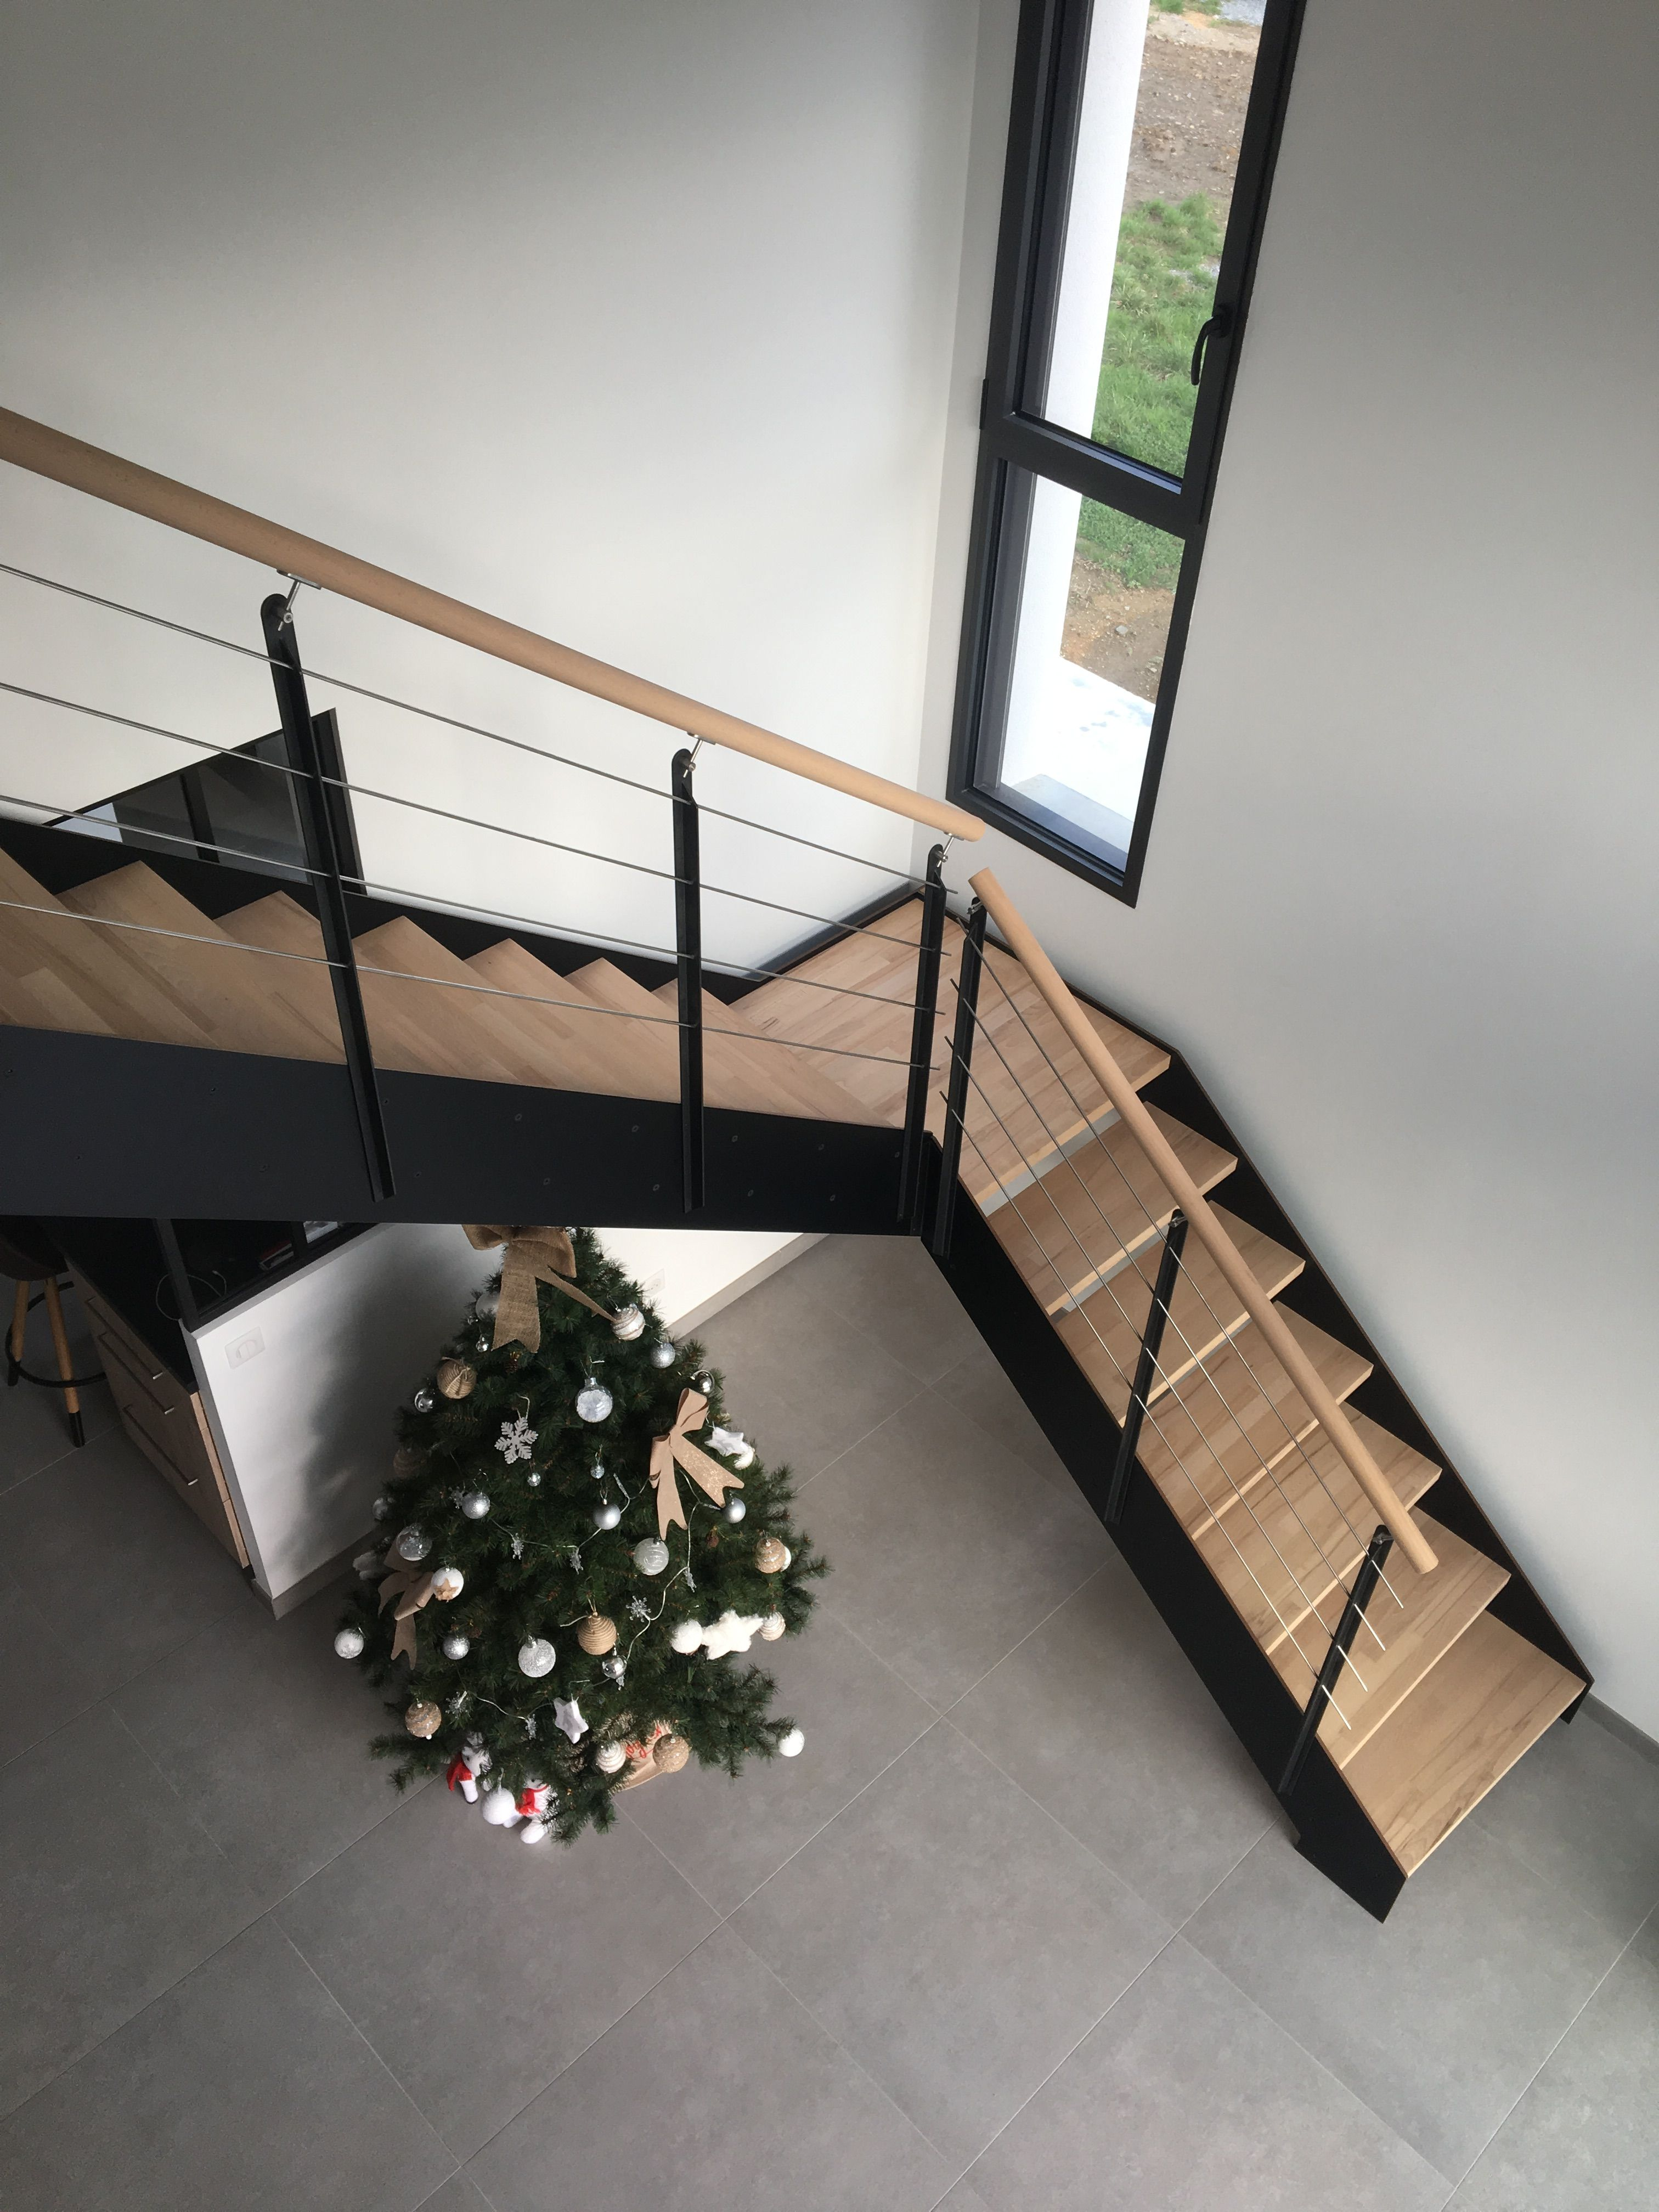 Escalier Industriel Loft Avec Palier Intermediaire Escalier